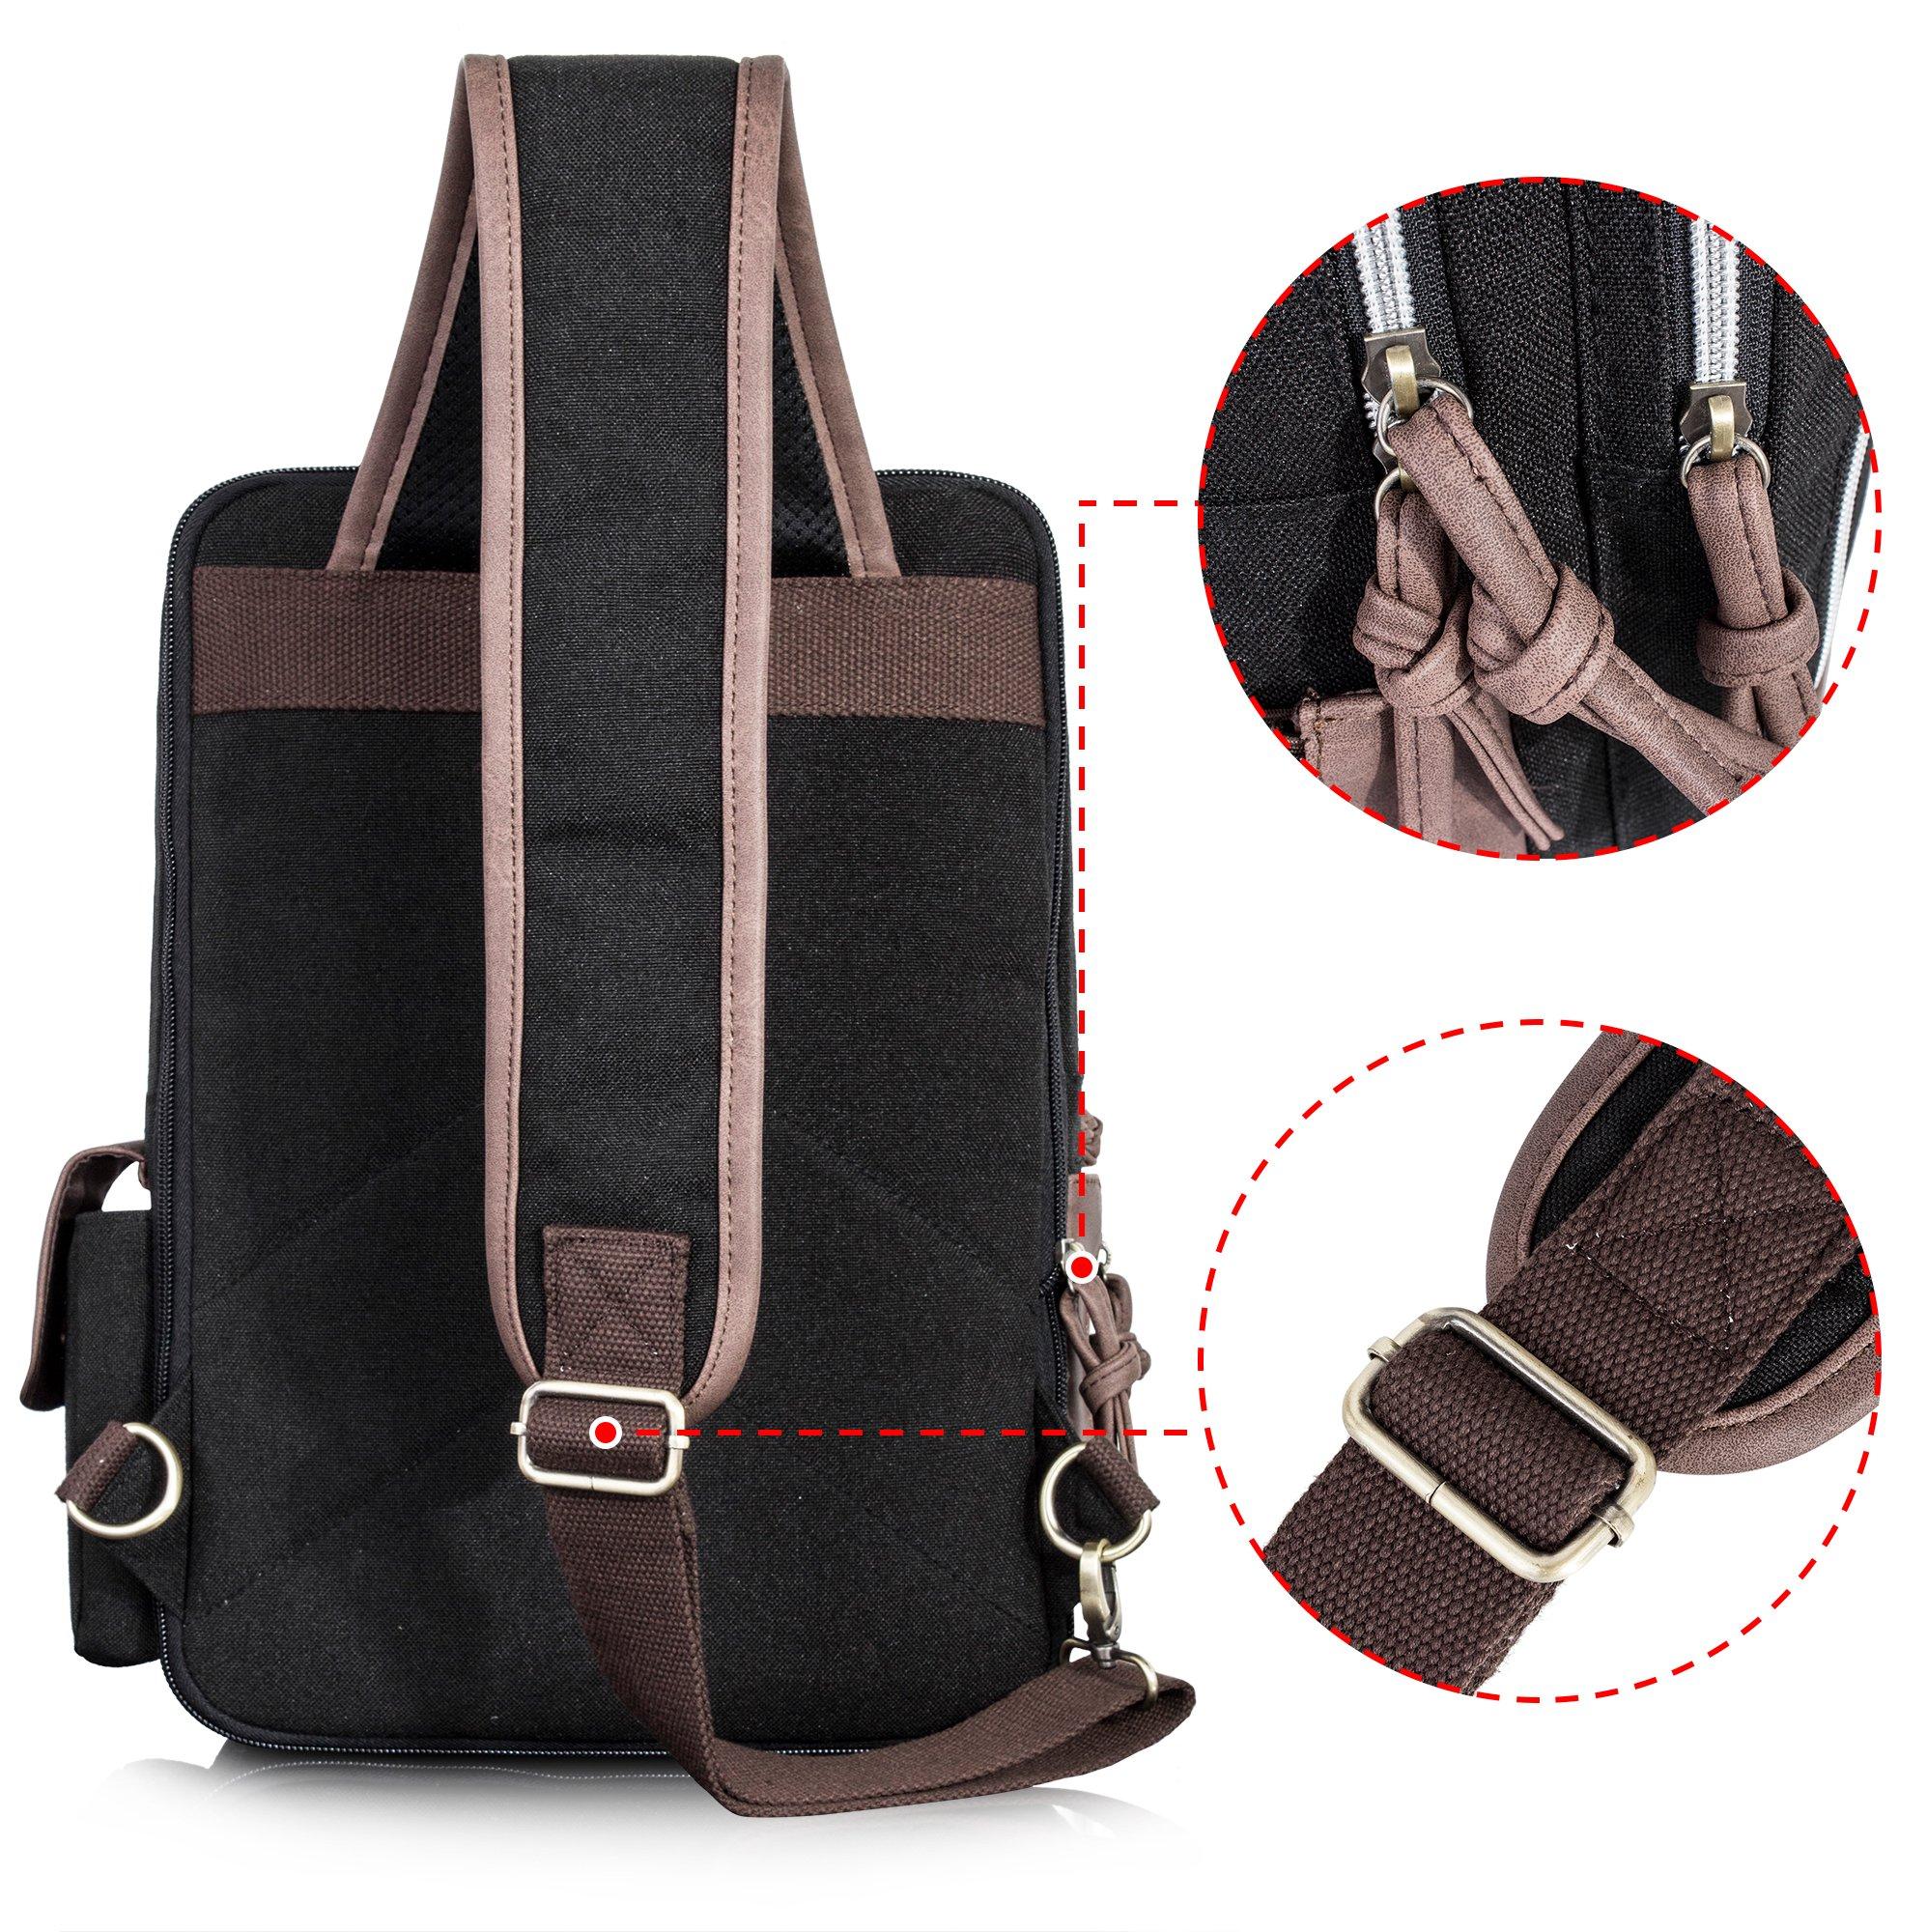 Leaper Retro Messenger Bag Outdoor Cross Body Sling Bag Travel Bag Shoulder Backpack (Black3103) by Leaper (Image #4)